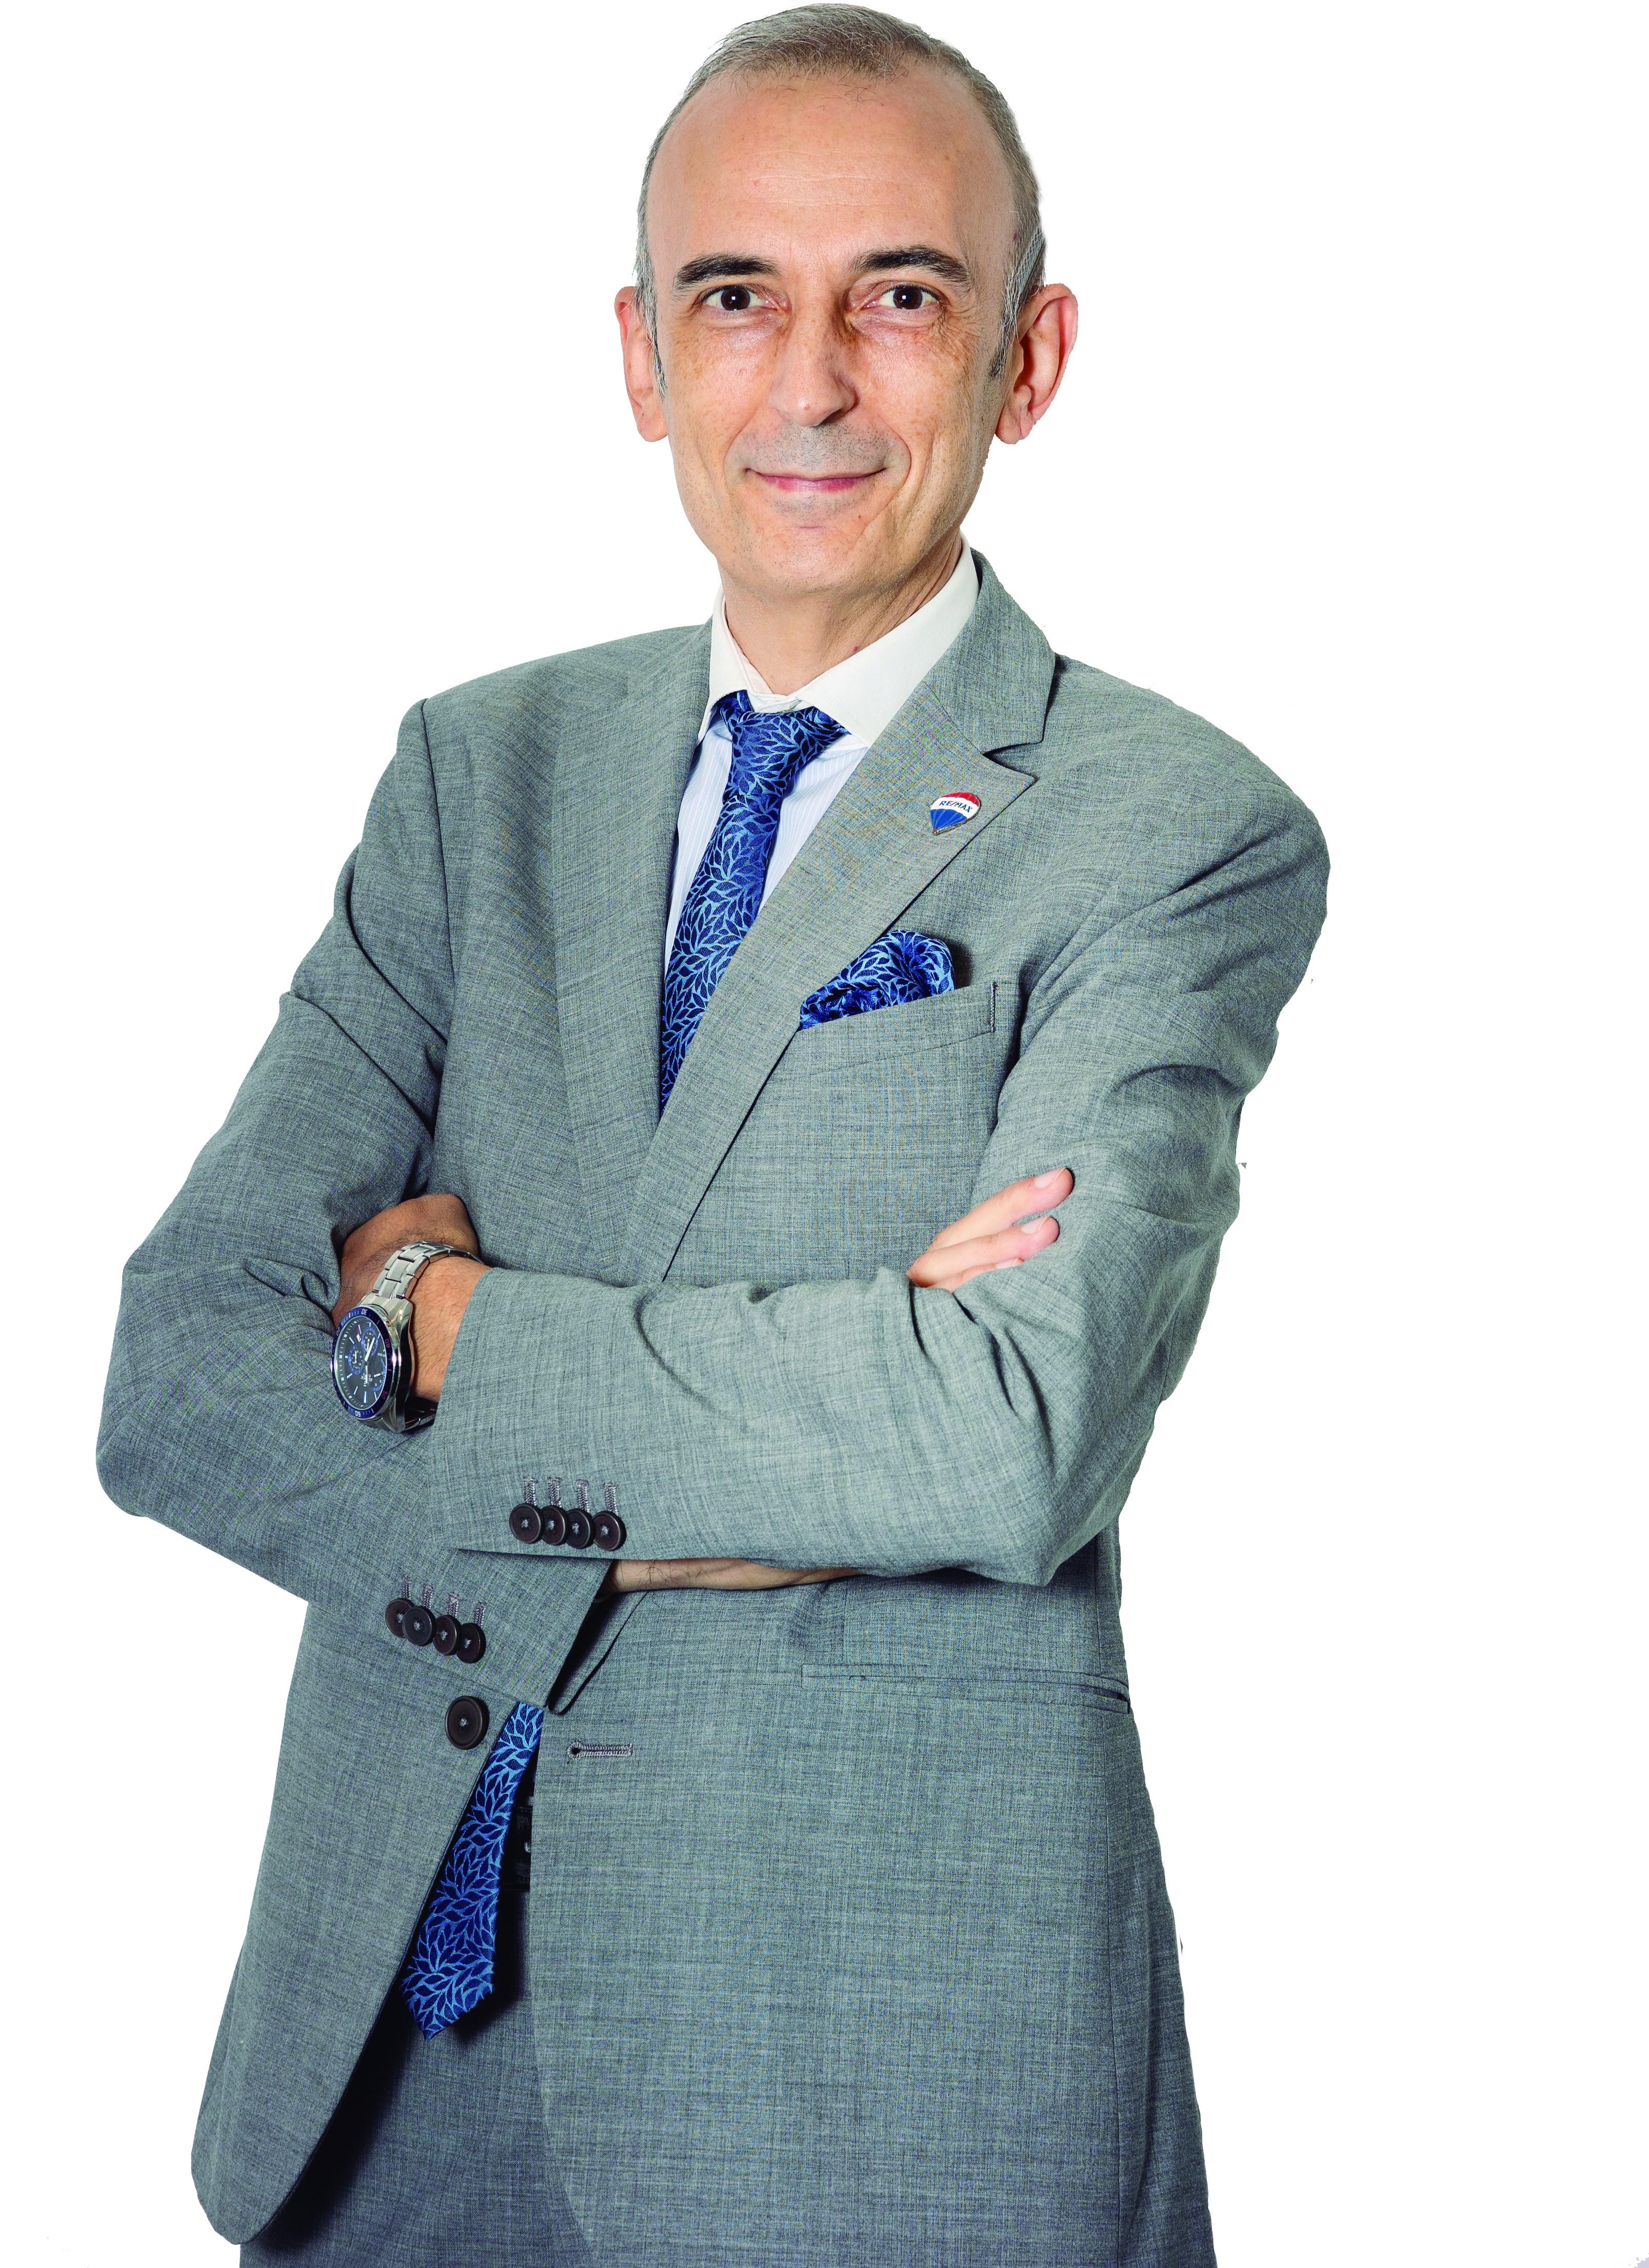 Manuel Domingo Jiménez Herrero